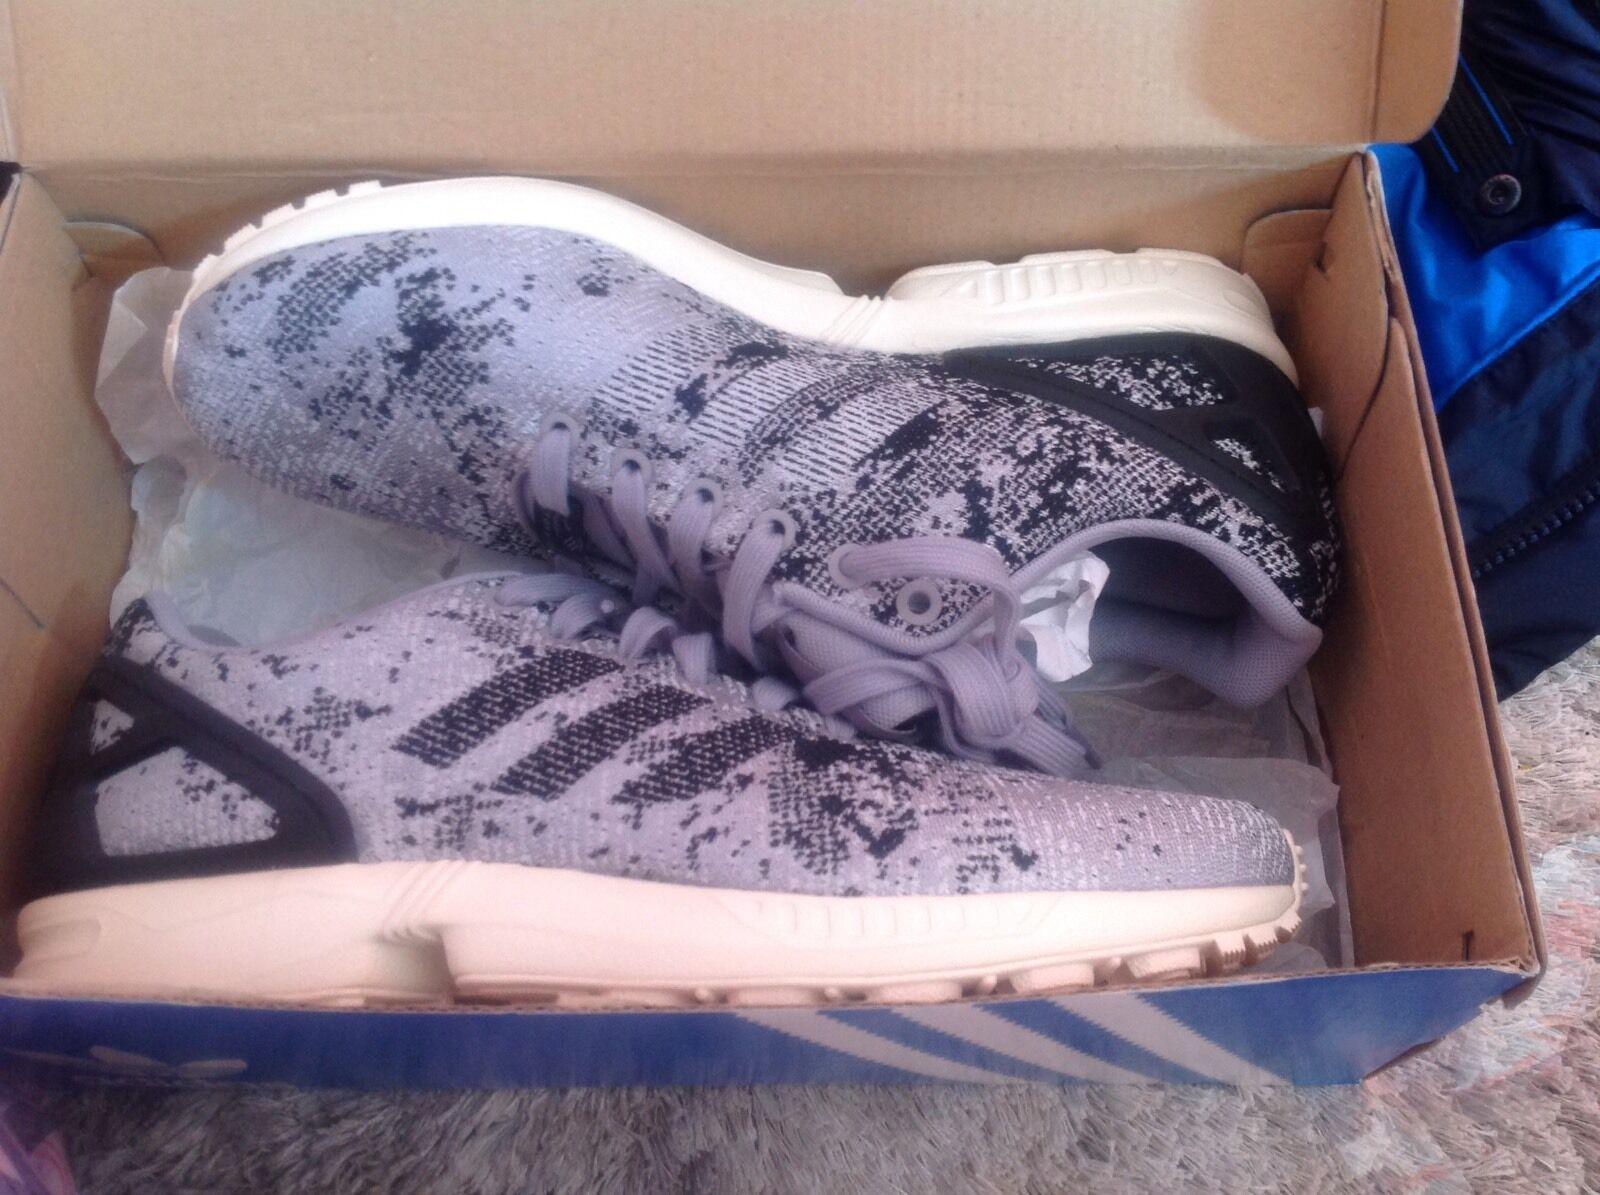 c87f0c2e4 ... adidas Originals ZX flux Weave B23601 mens Shoes Gray black Gray black  Gray